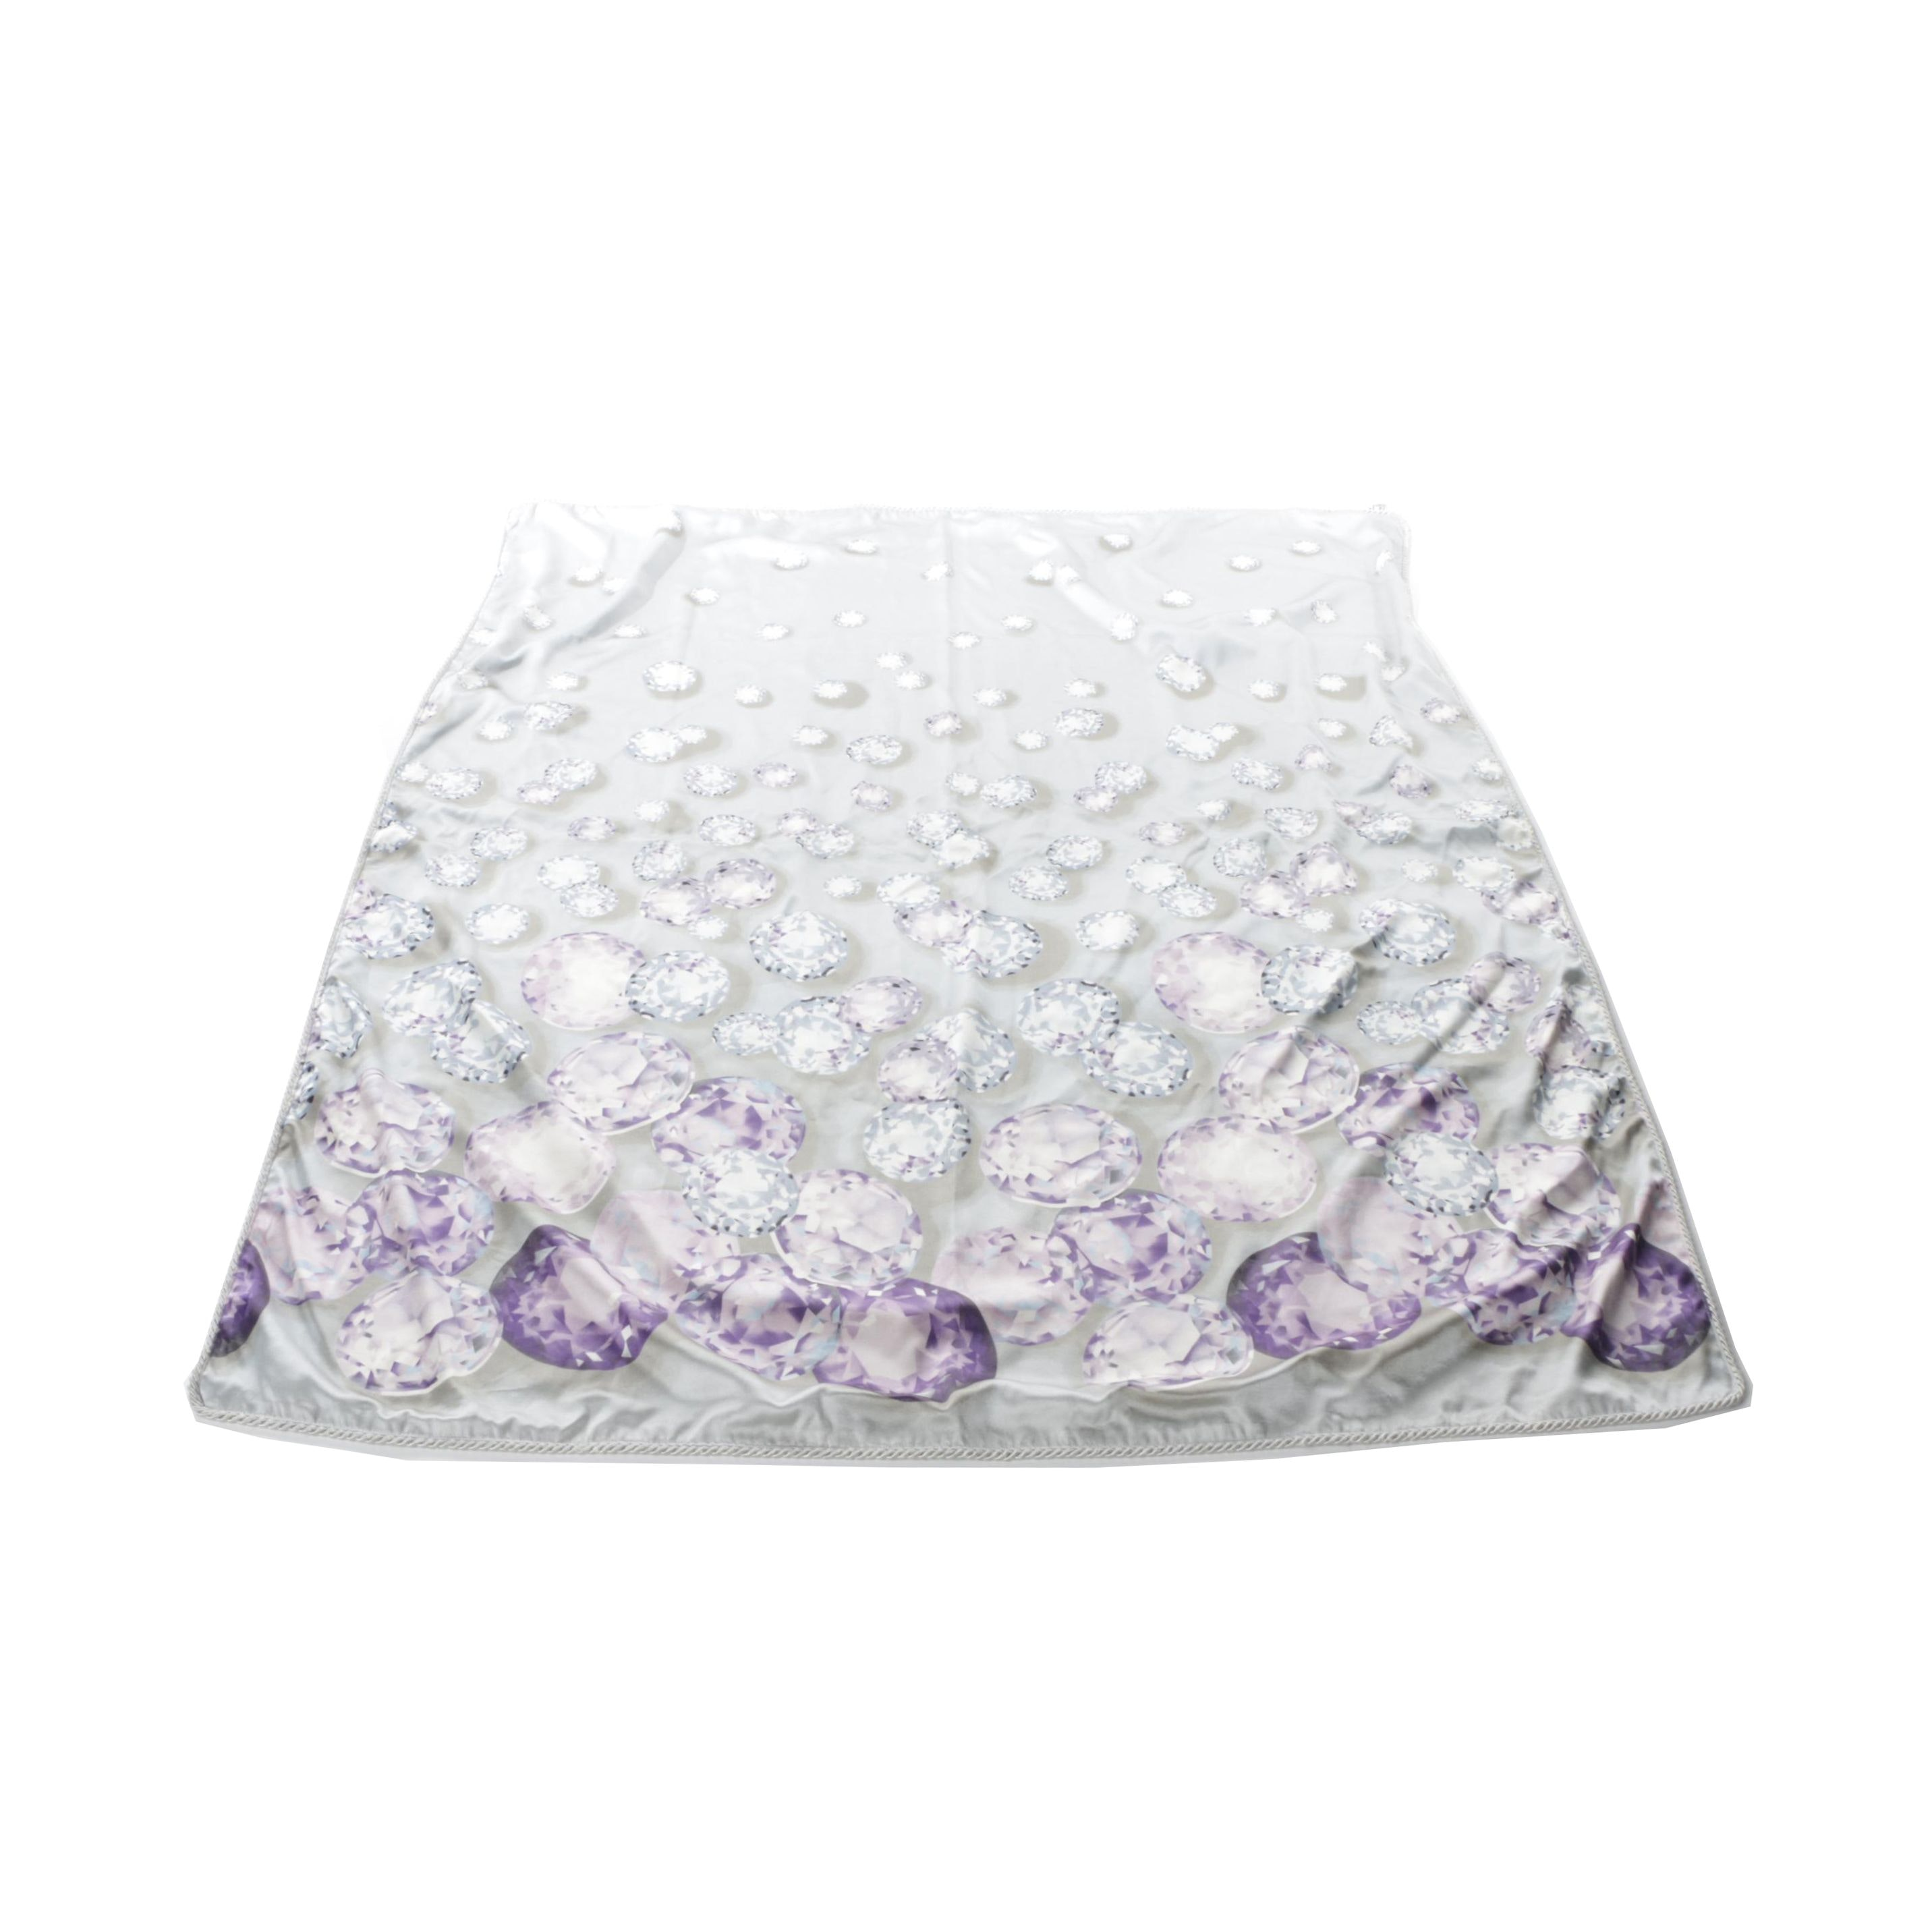 Versace Silk Diamond Bedspread